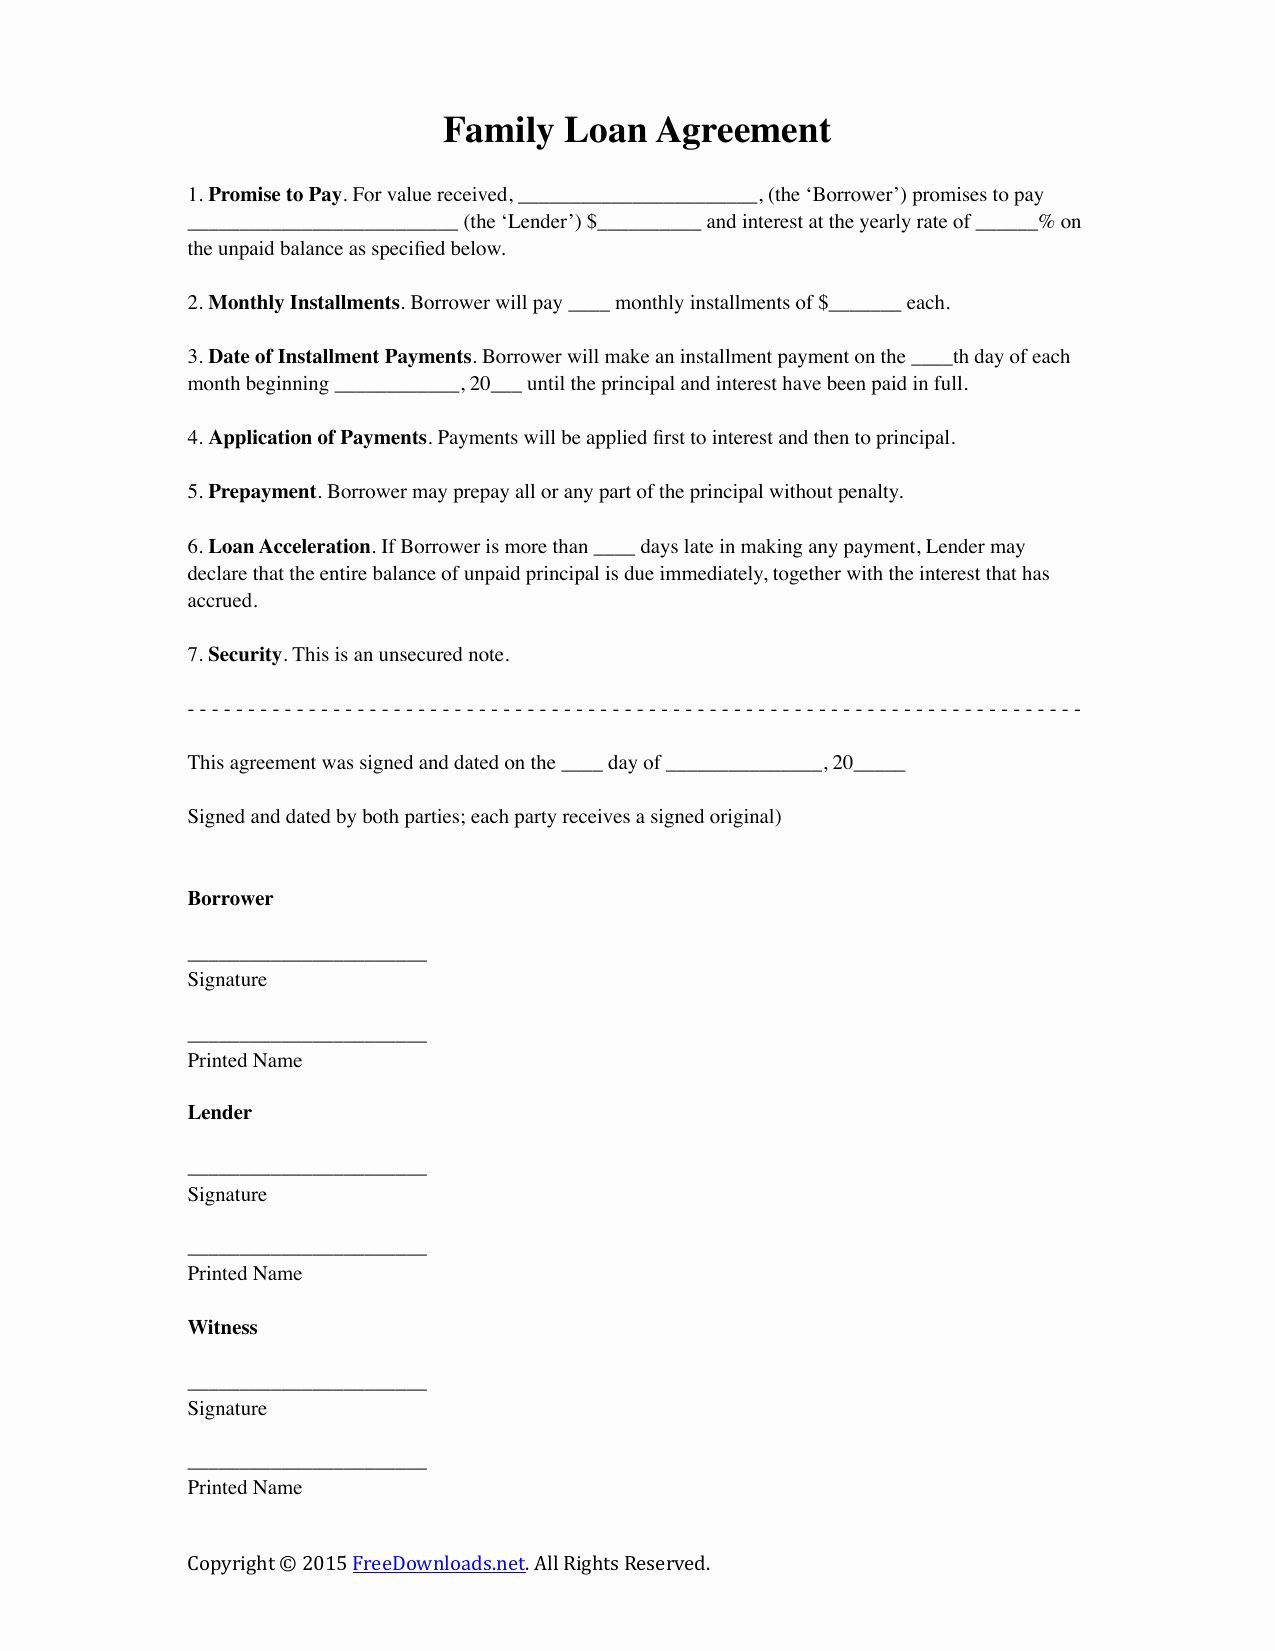 000 Awful Family Loan Agreement Template Pdf Sample  FreeFull